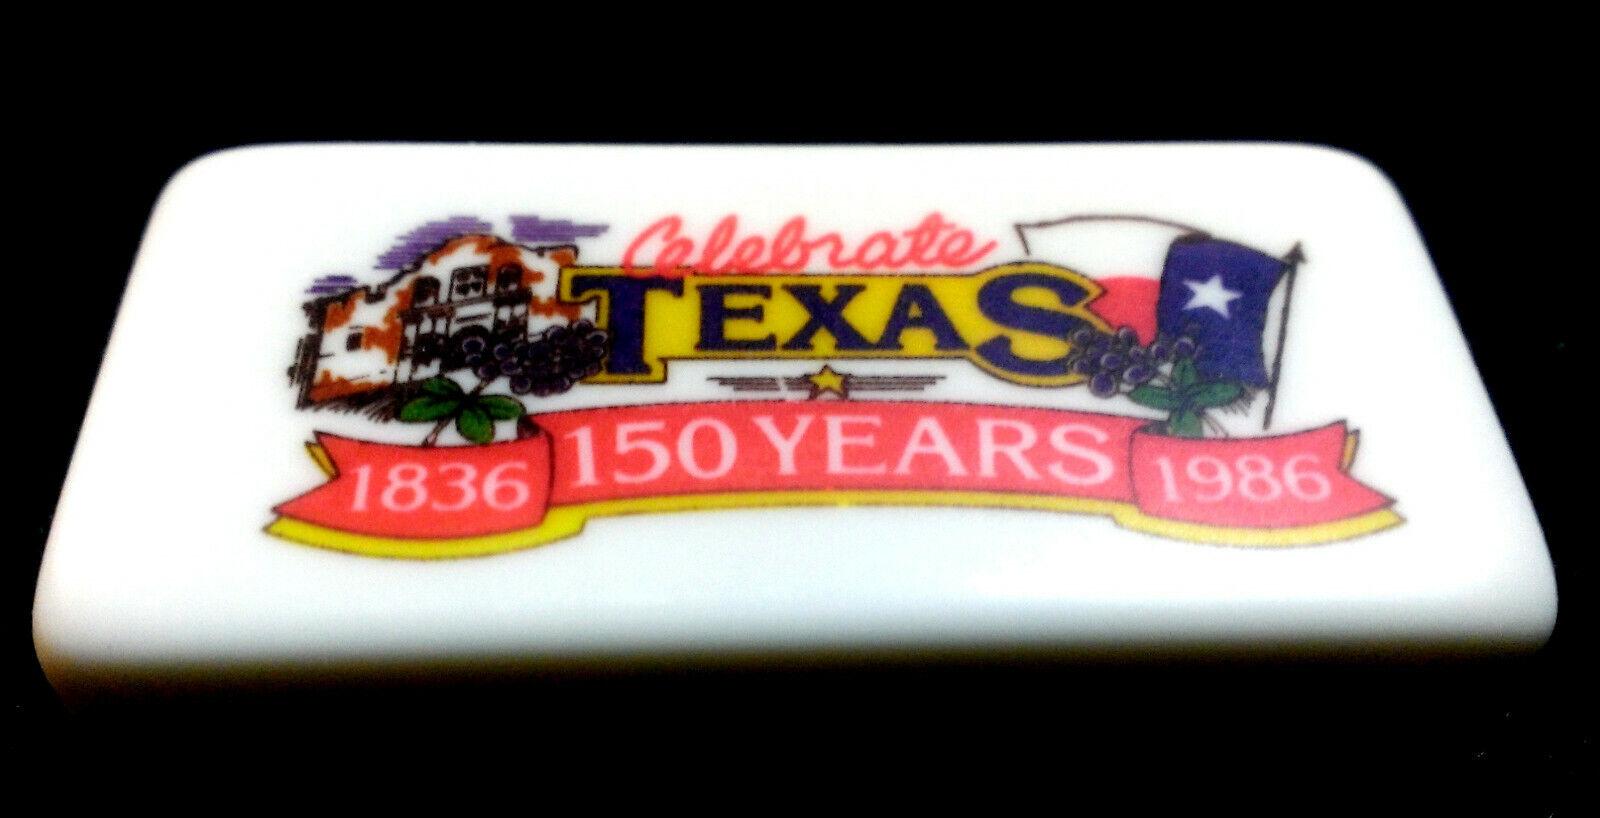 Vintage Puremco marblelike Standard 616 dominos célébrer Texas 1836 - 1986